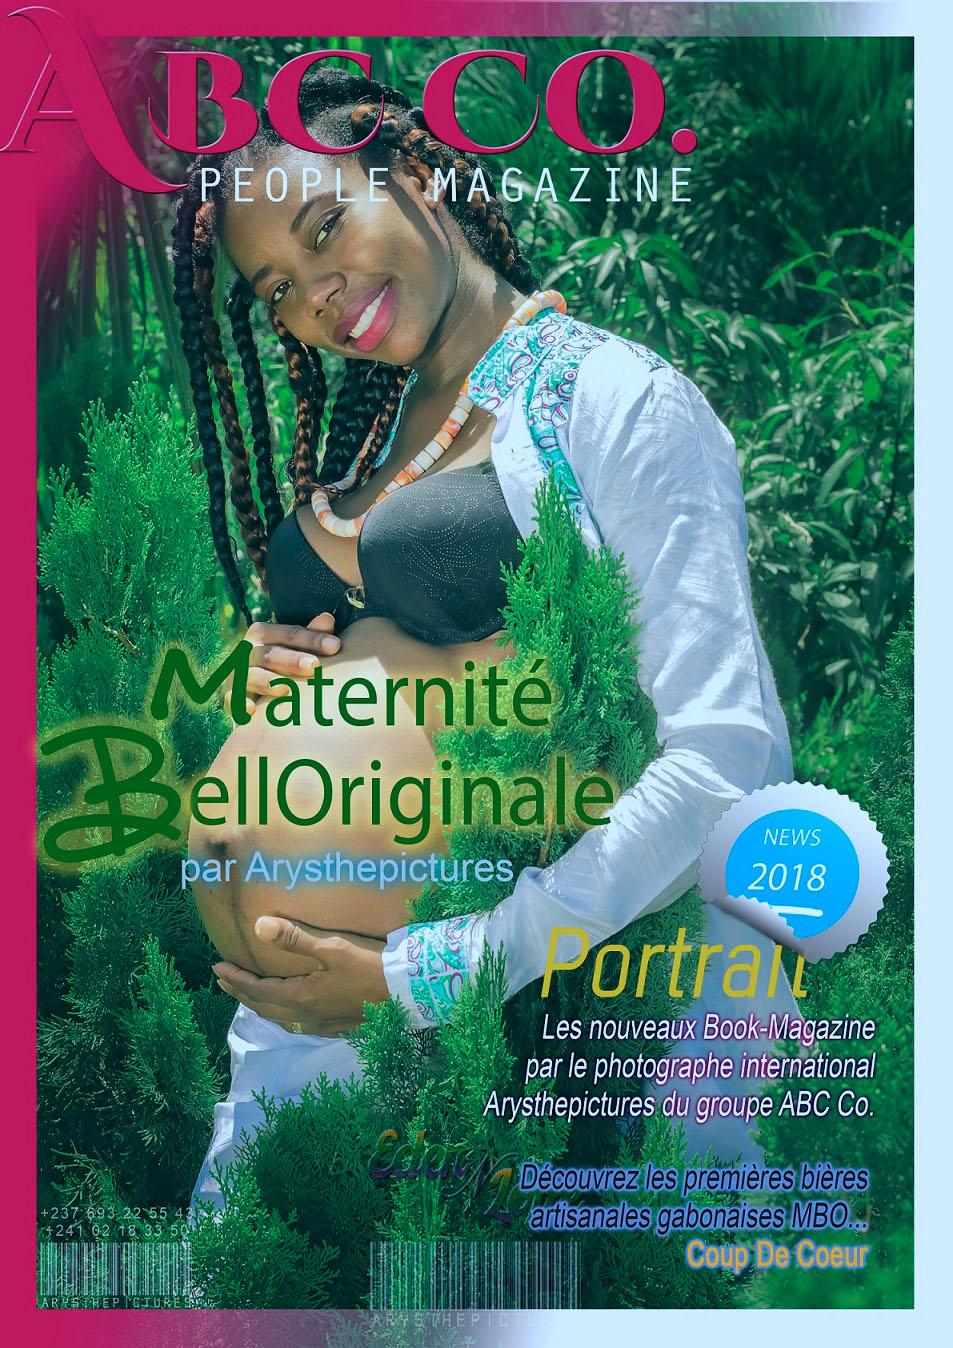 Book-Mag #people (pregnancy photo)